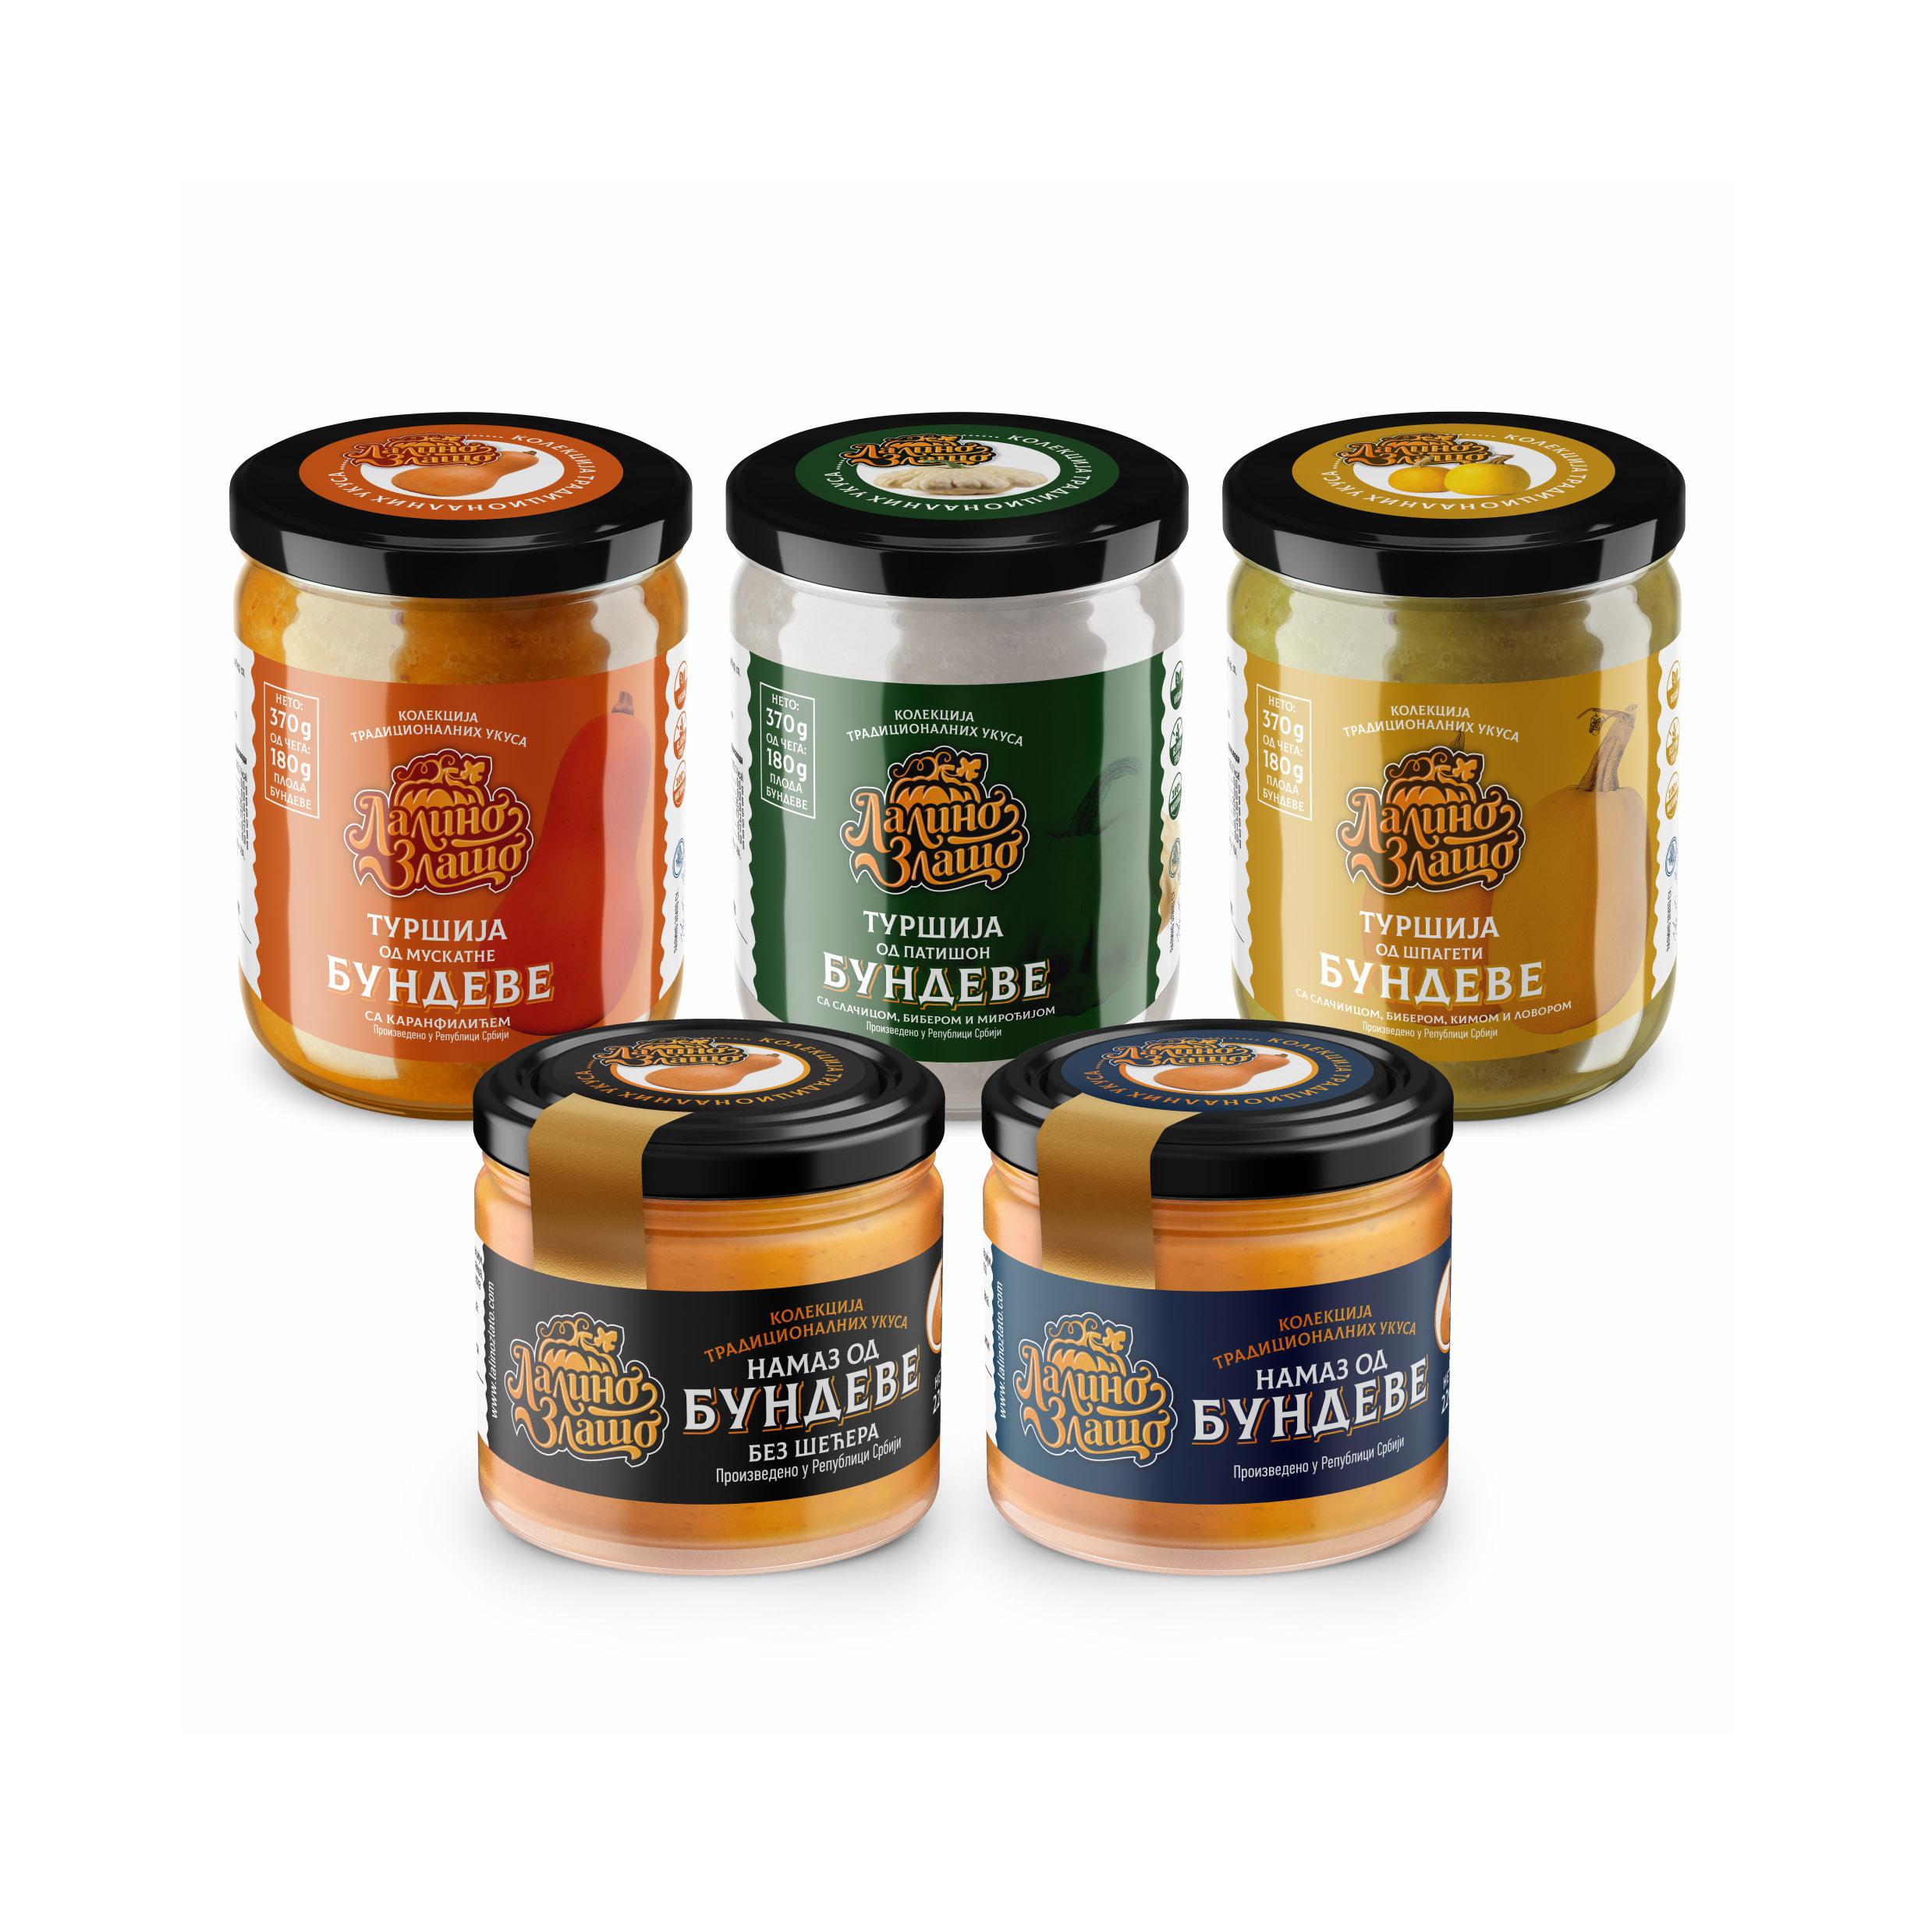 Lalino zlato packaging design